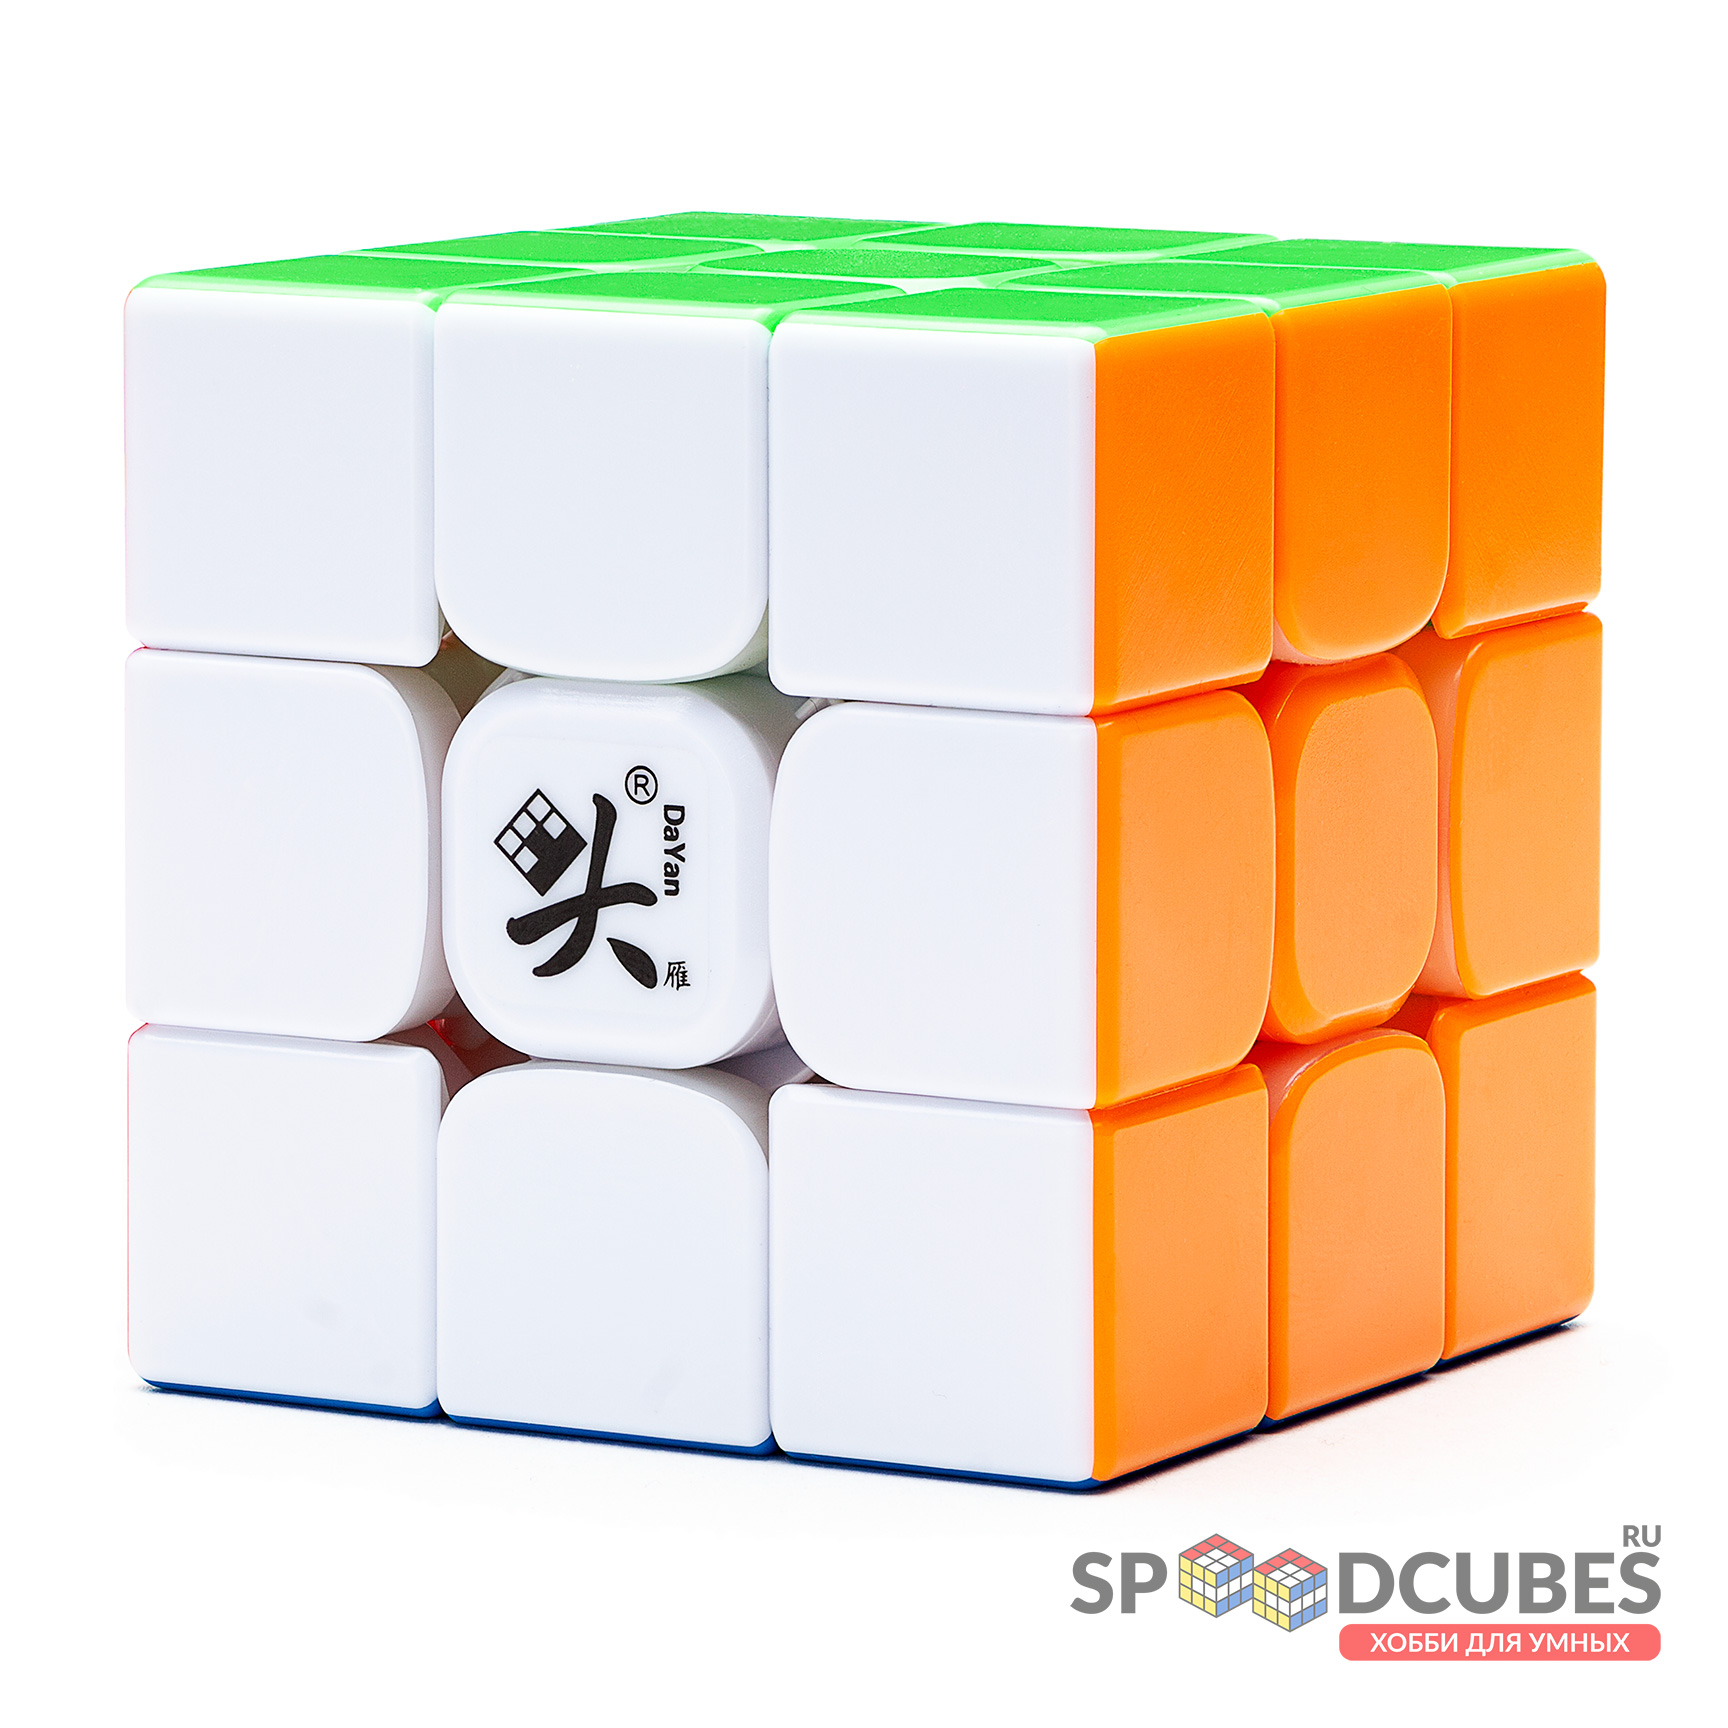 DaYan 3x3x3 TengYun V2 M